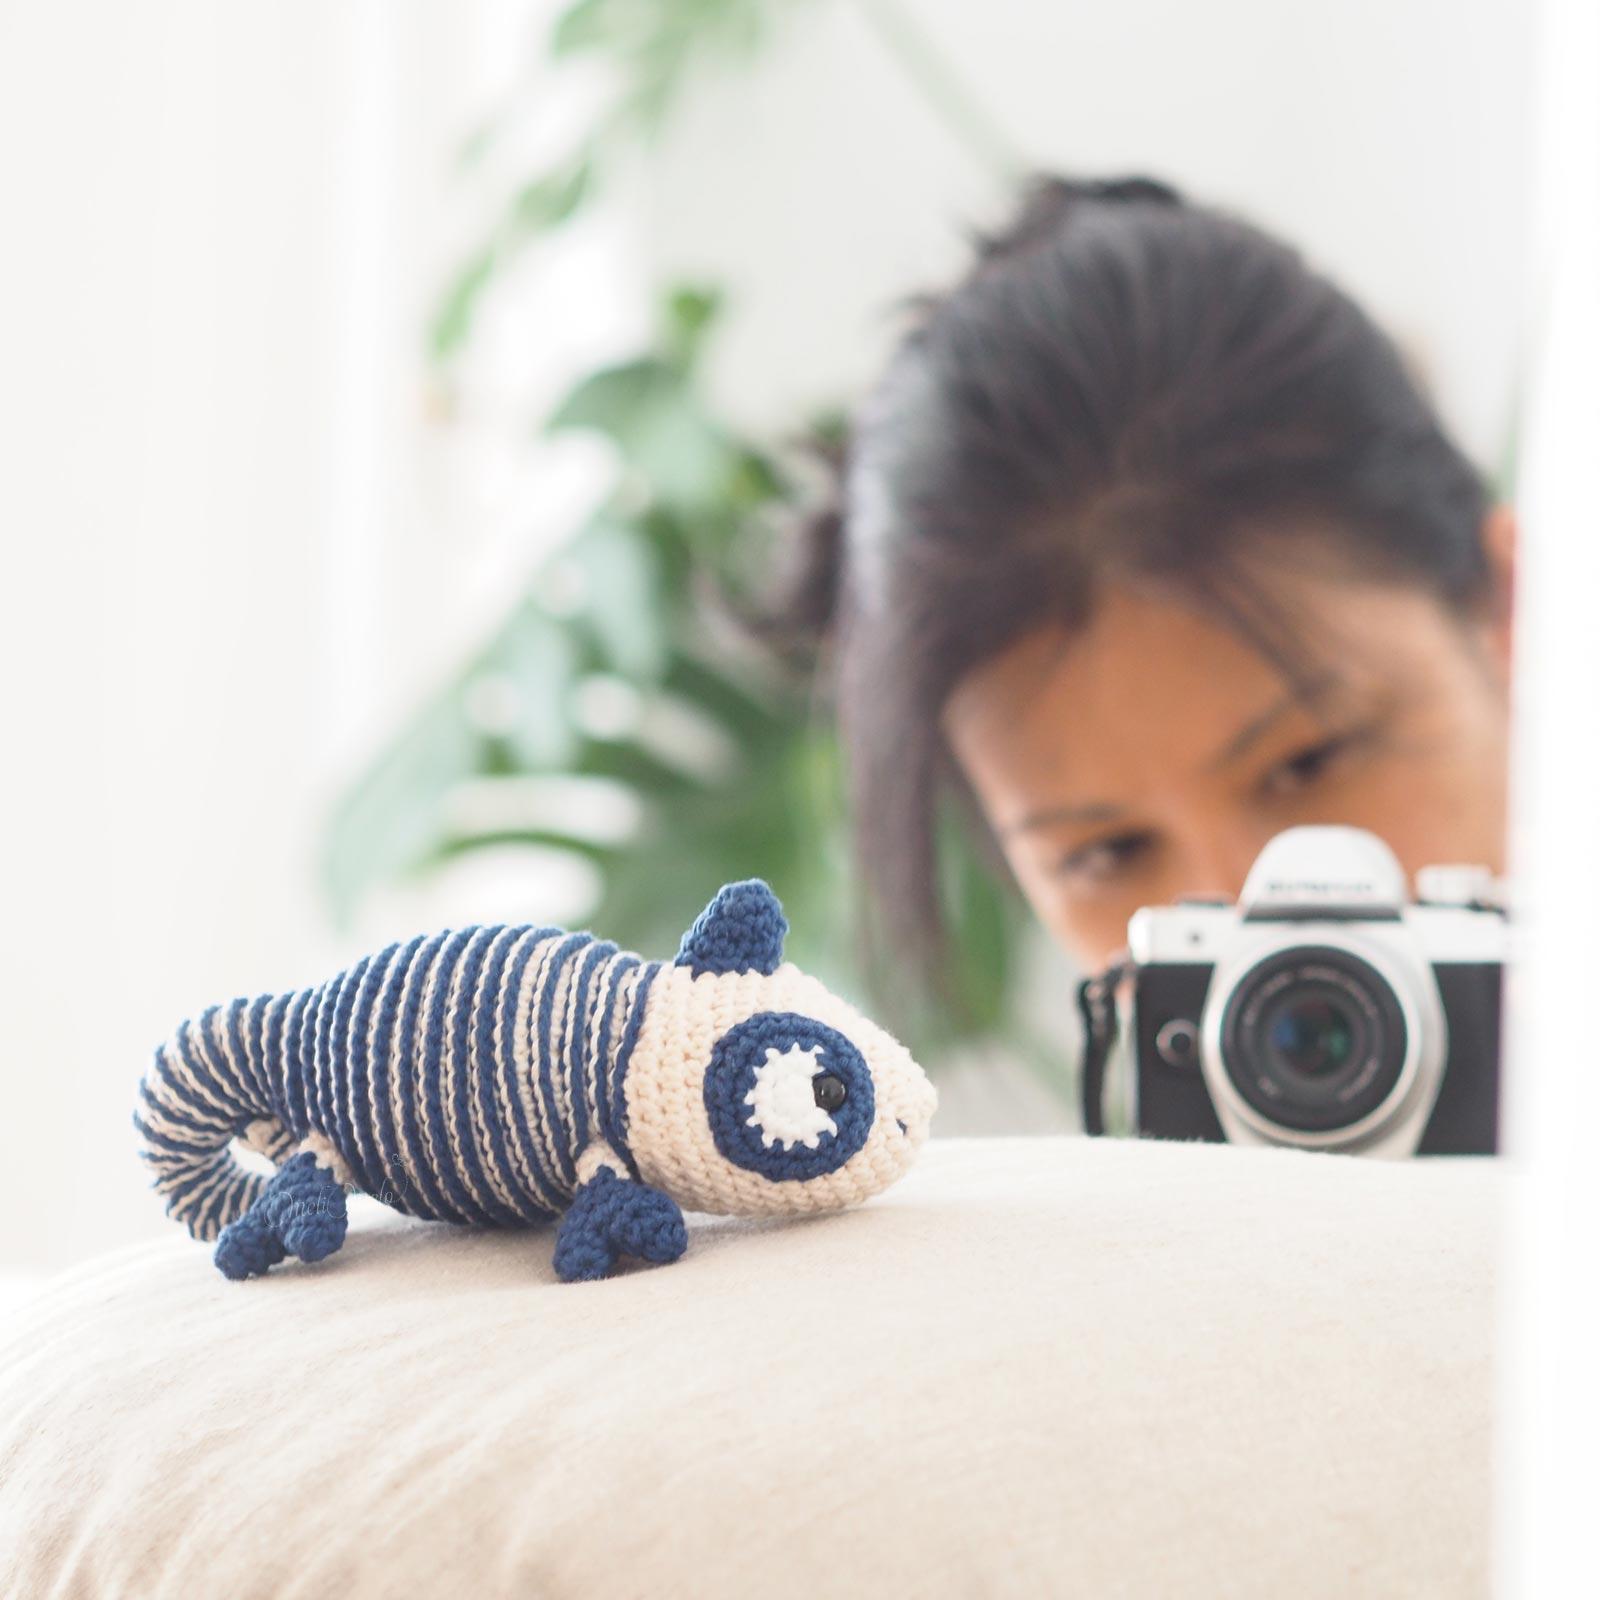 crochet chameleon juliakapattern Ricorumi coton doudou amigurumi cameleon mariniere laboutiquedemelimelo